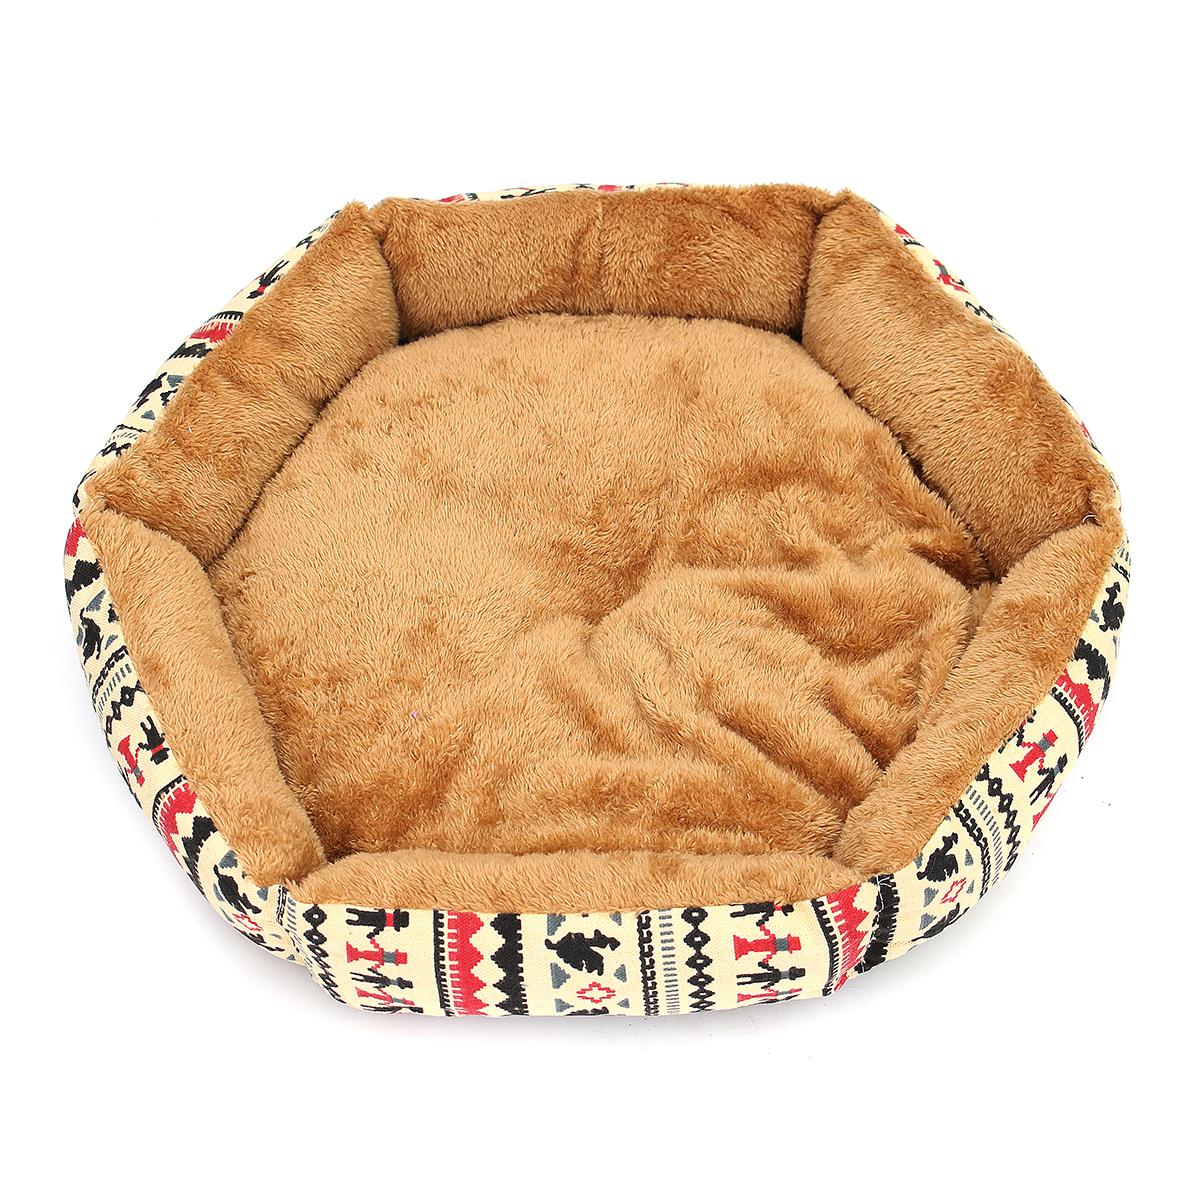 48cm Pet Dog Cat Bed Soft Cushion Winter Warm Kennel Mat Pad Blanket Gift